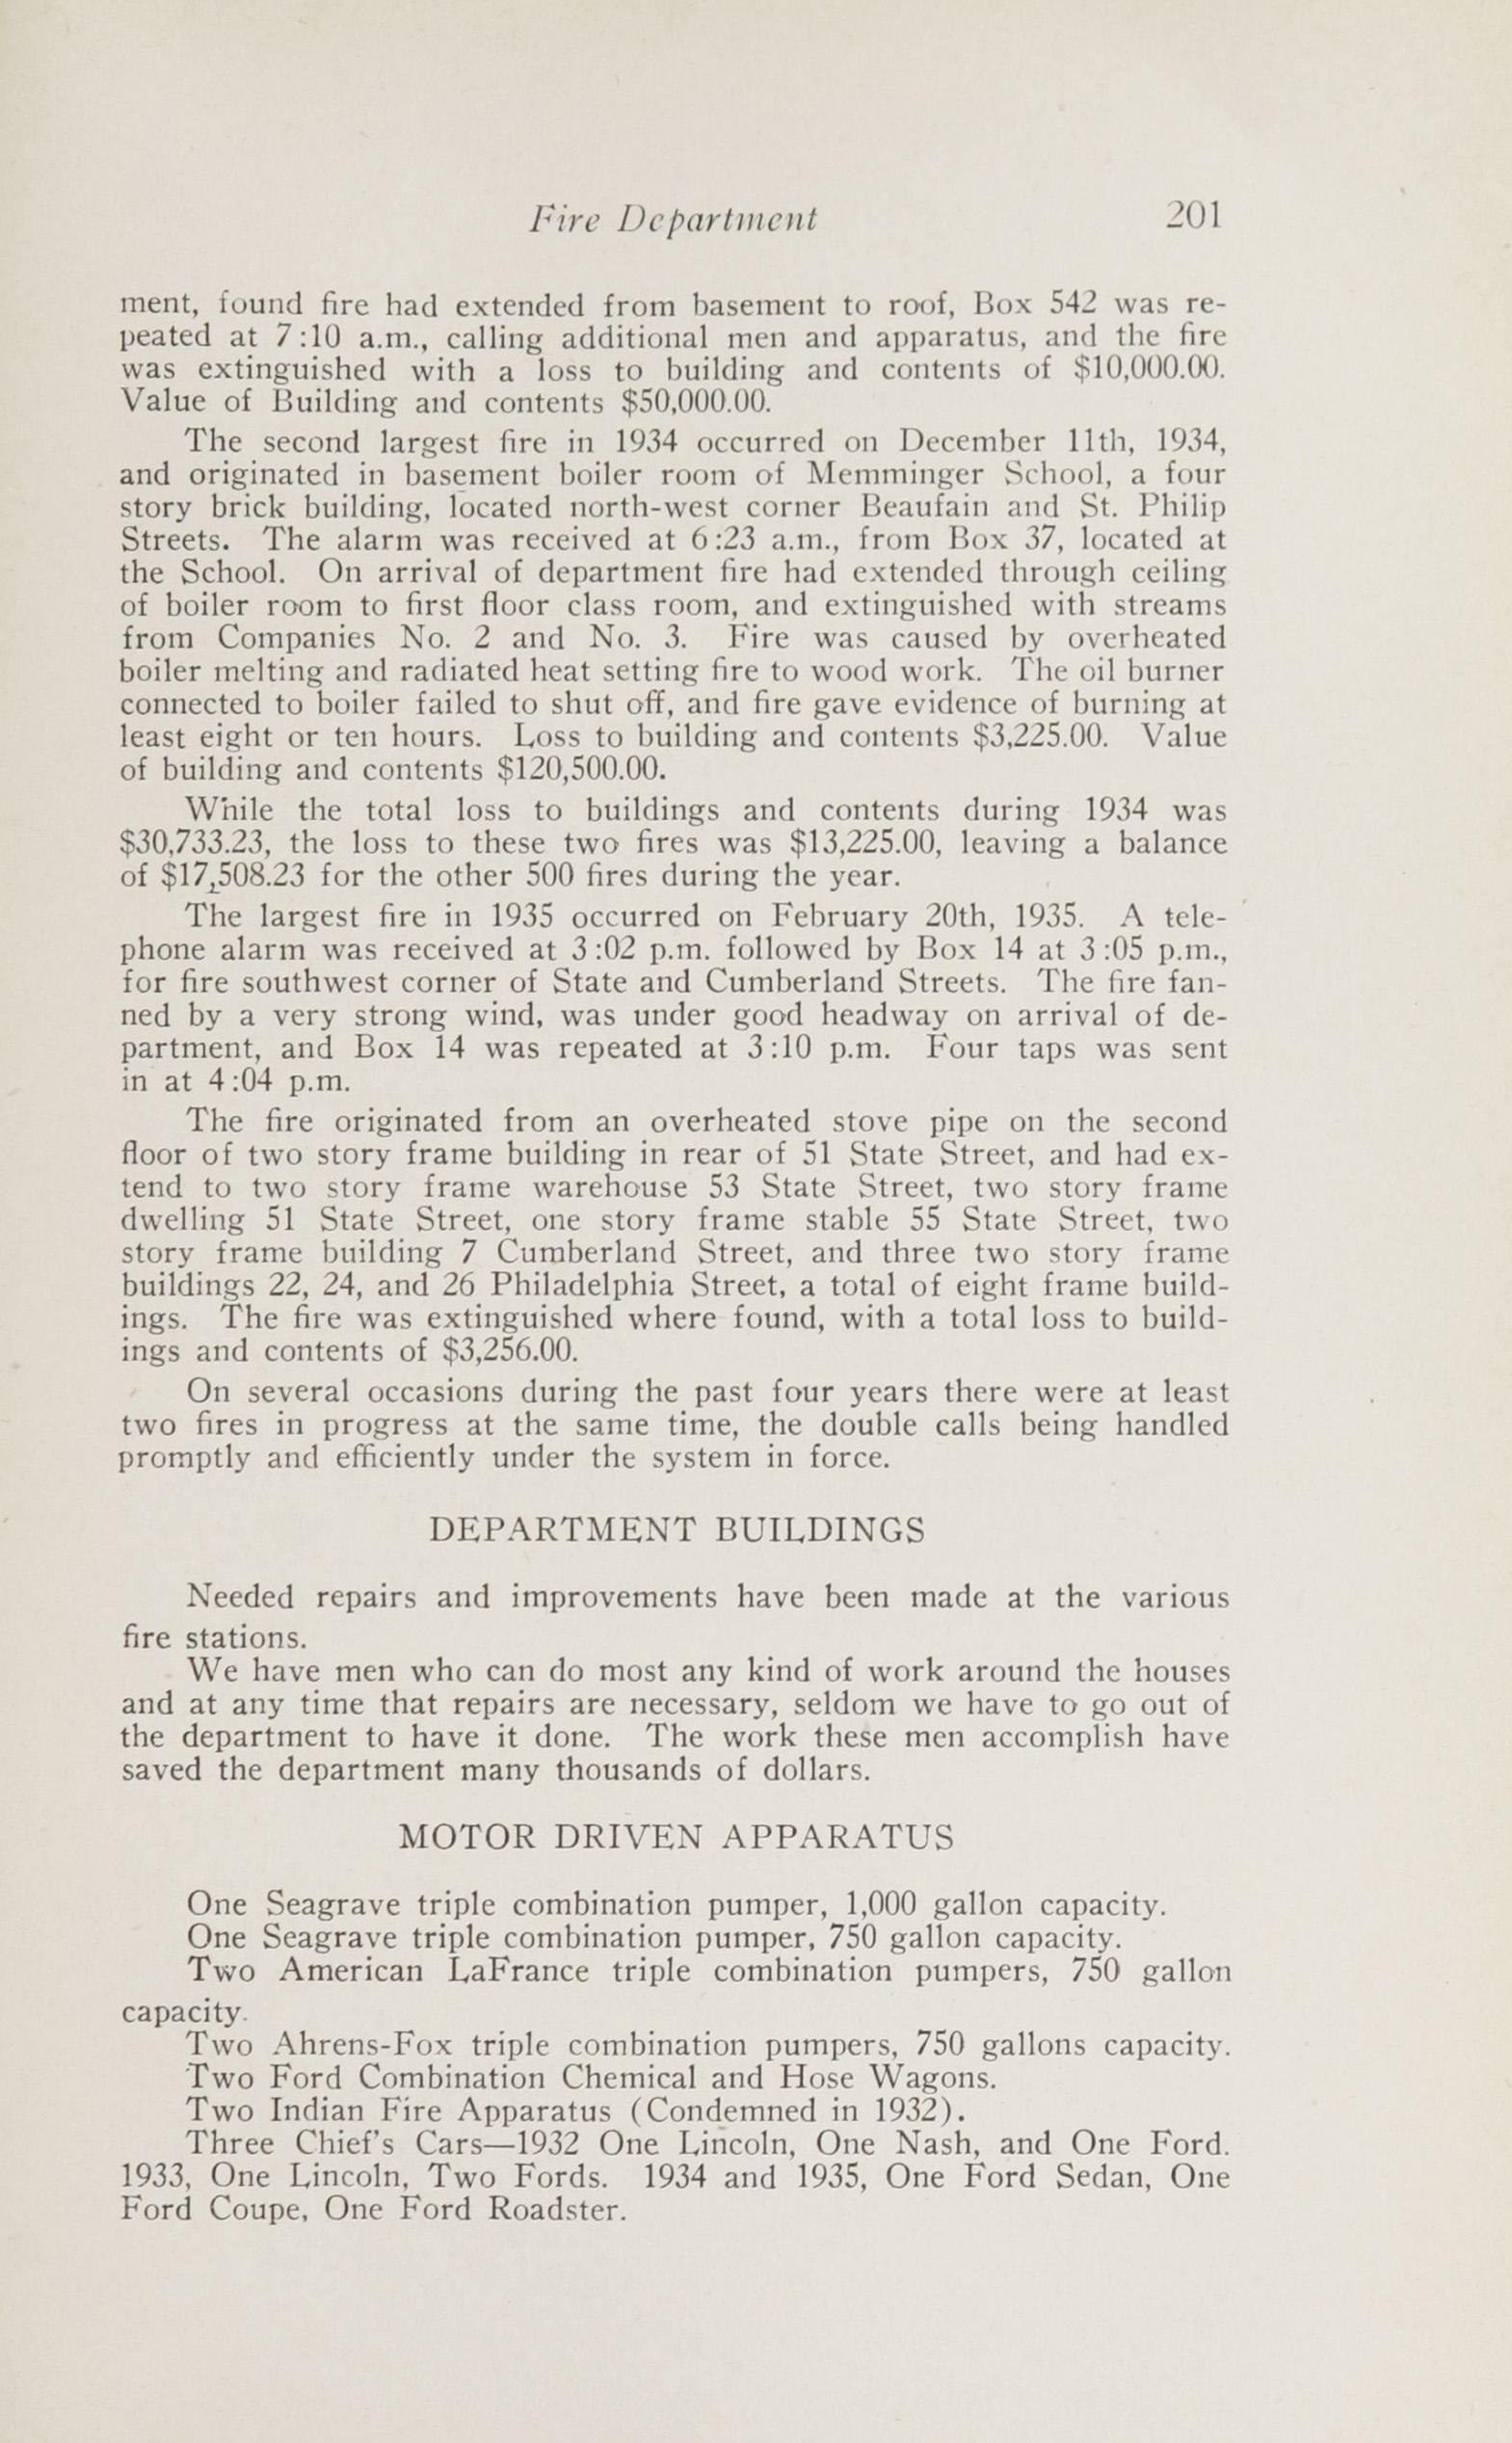 Charleston Yearbook, 1932-1935, page 201